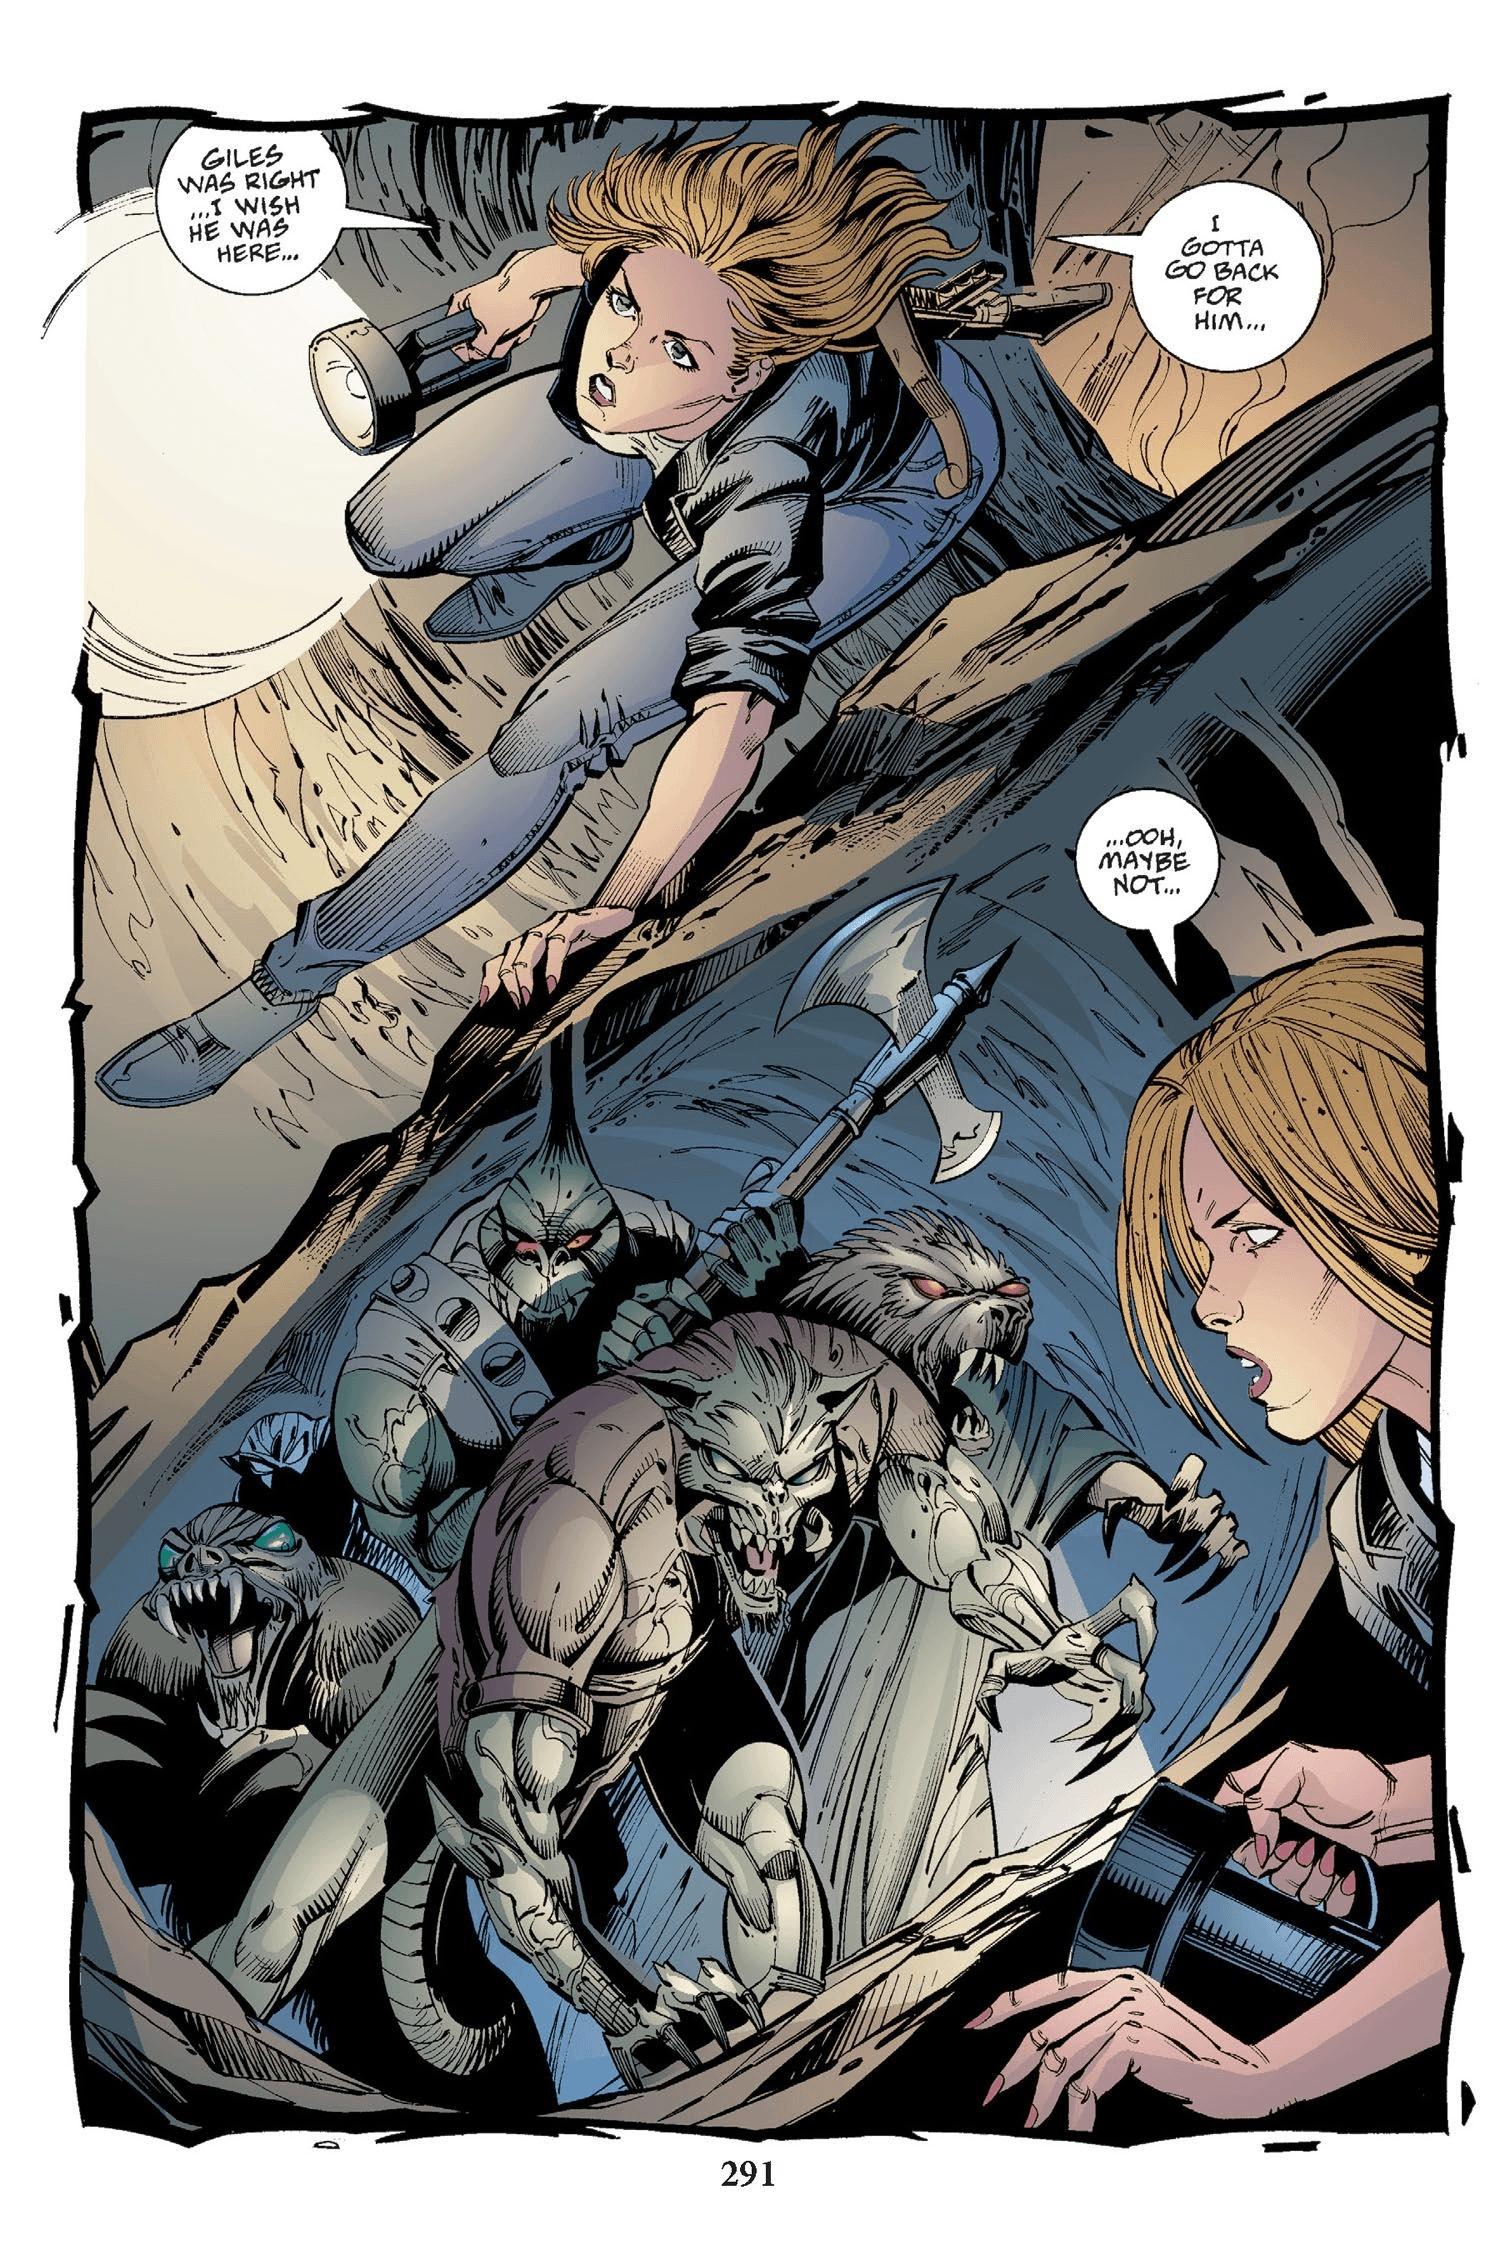 Read online Buffy the Vampire Slayer: Omnibus comic -  Issue # TPB 2 - 283